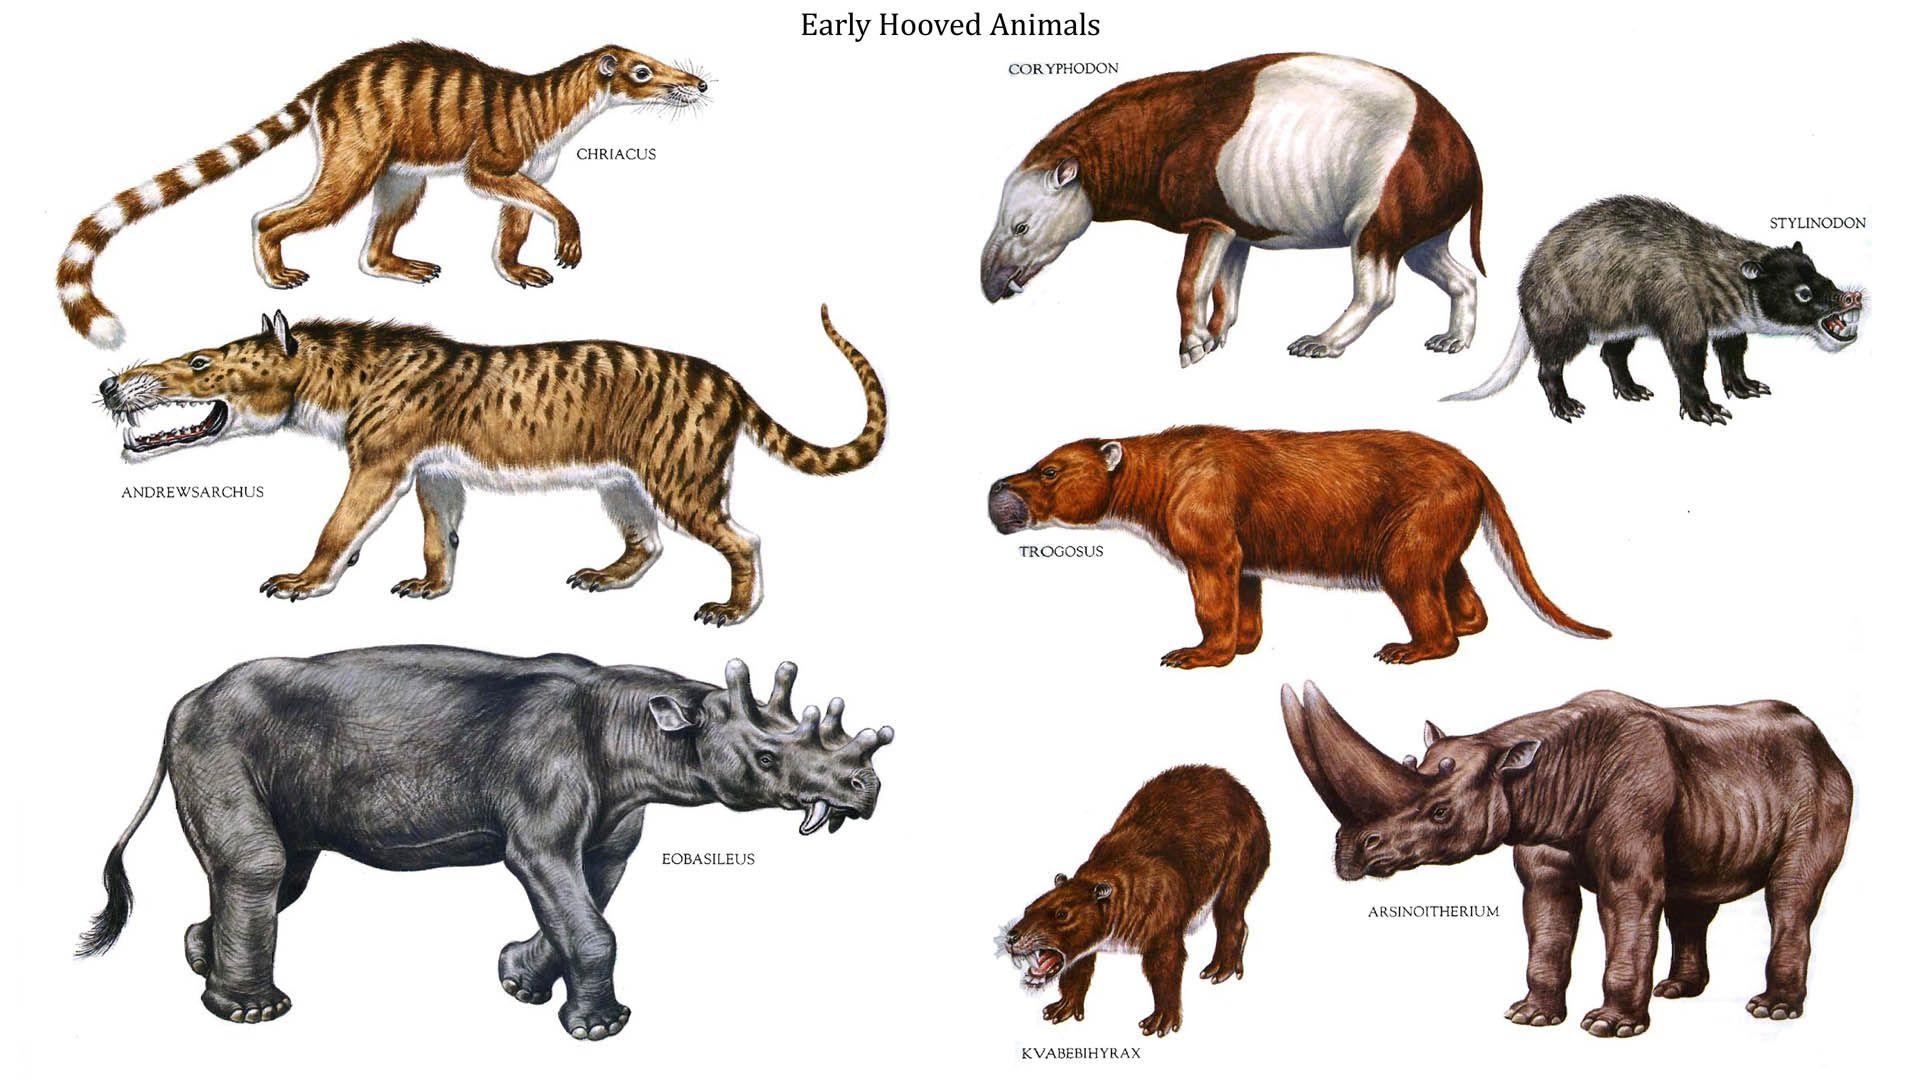 dinosaur - Google Search   Christmas Stockings   Pinterest ... Extinct Species Dinosaurs